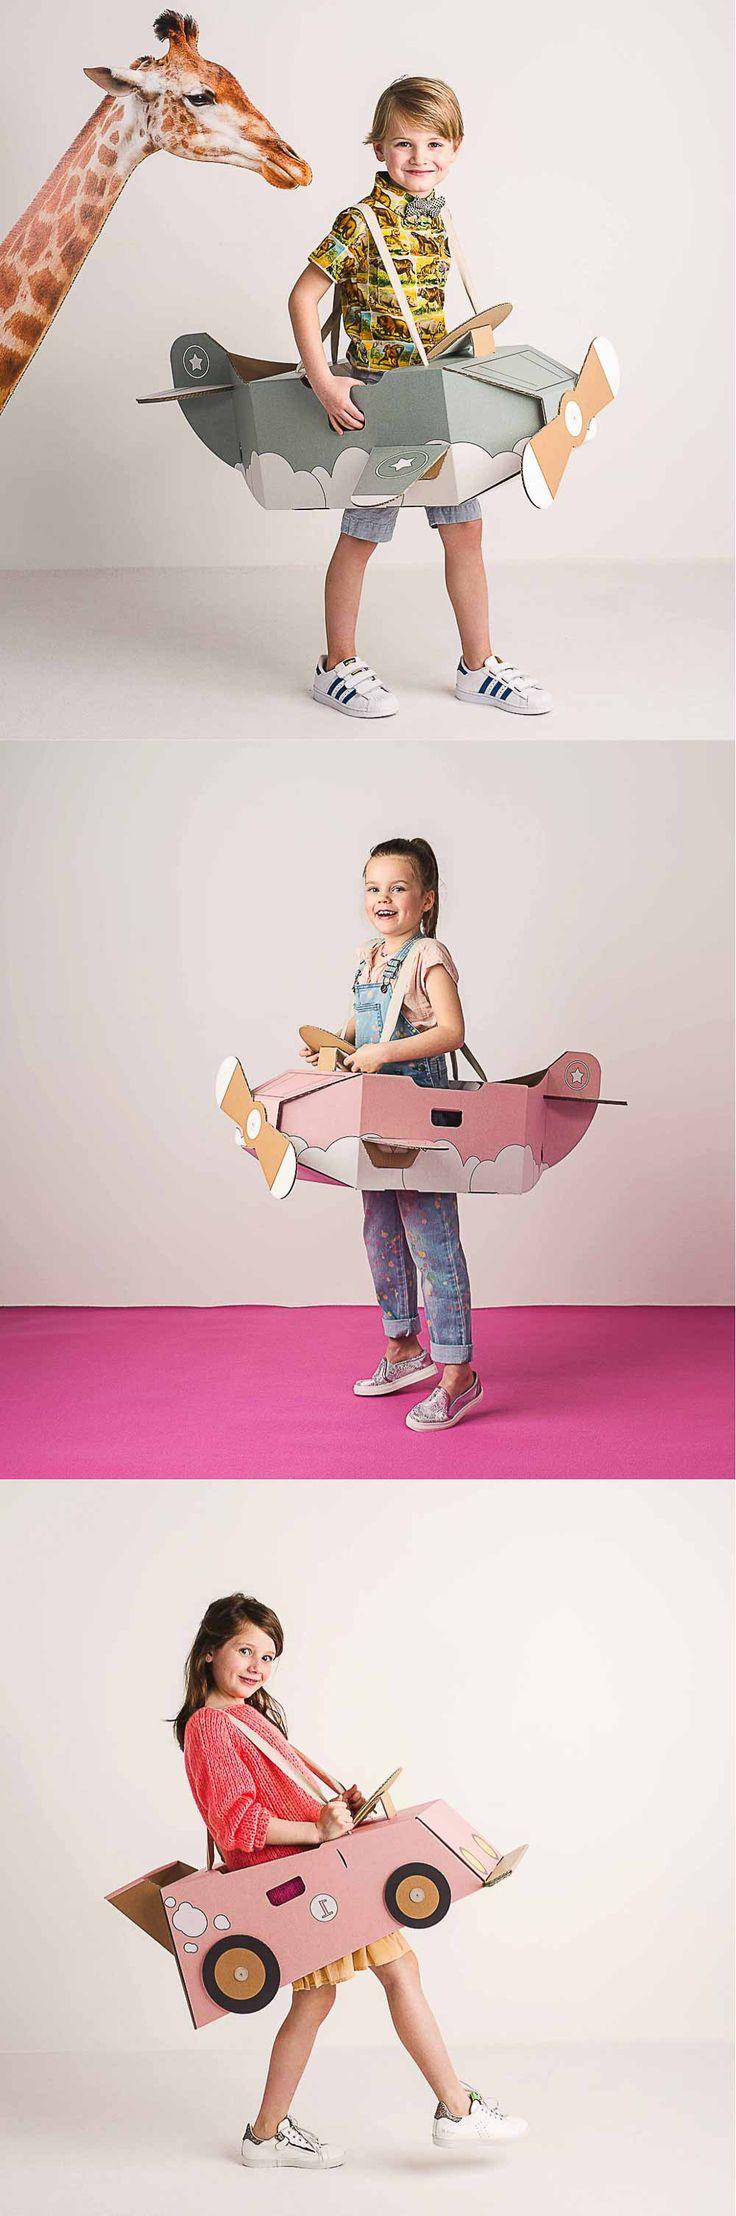 avión de cartón #aviondecarton #juguetes #juguetedecarton #avion #cartón #disfrazniño #disfraz #disfraavion